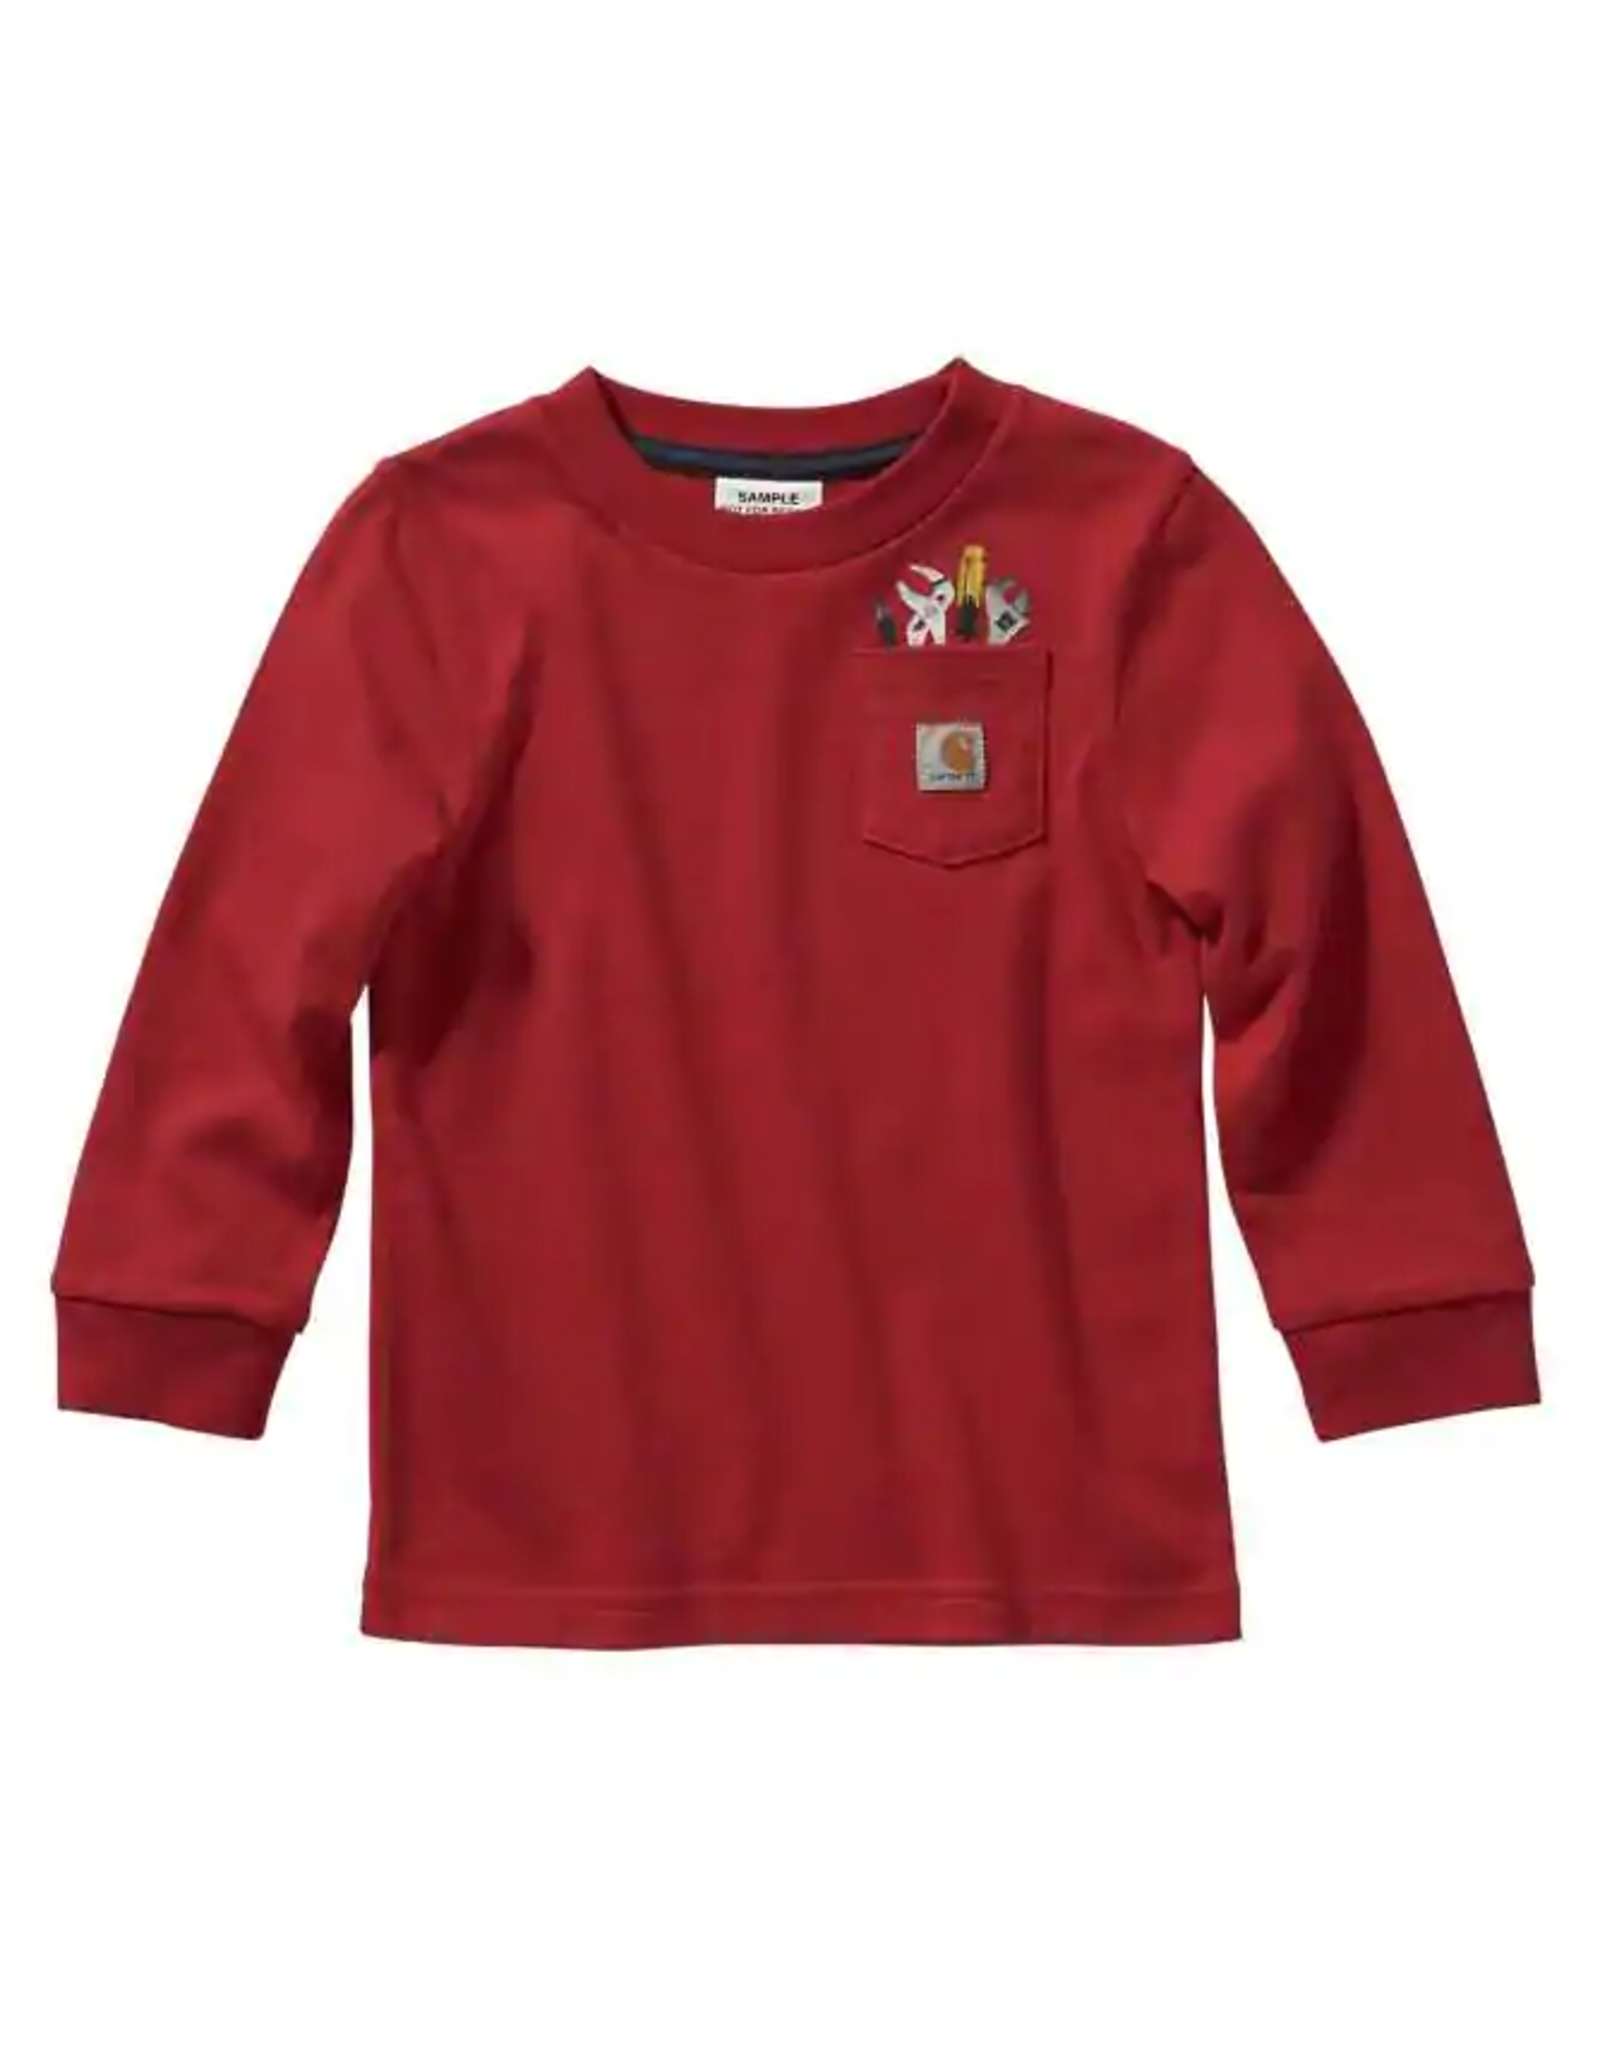 Carhartt Carhartt Kids CA6121 Toddler Long Sleeve Tee w/ Pocket - 2 Colors